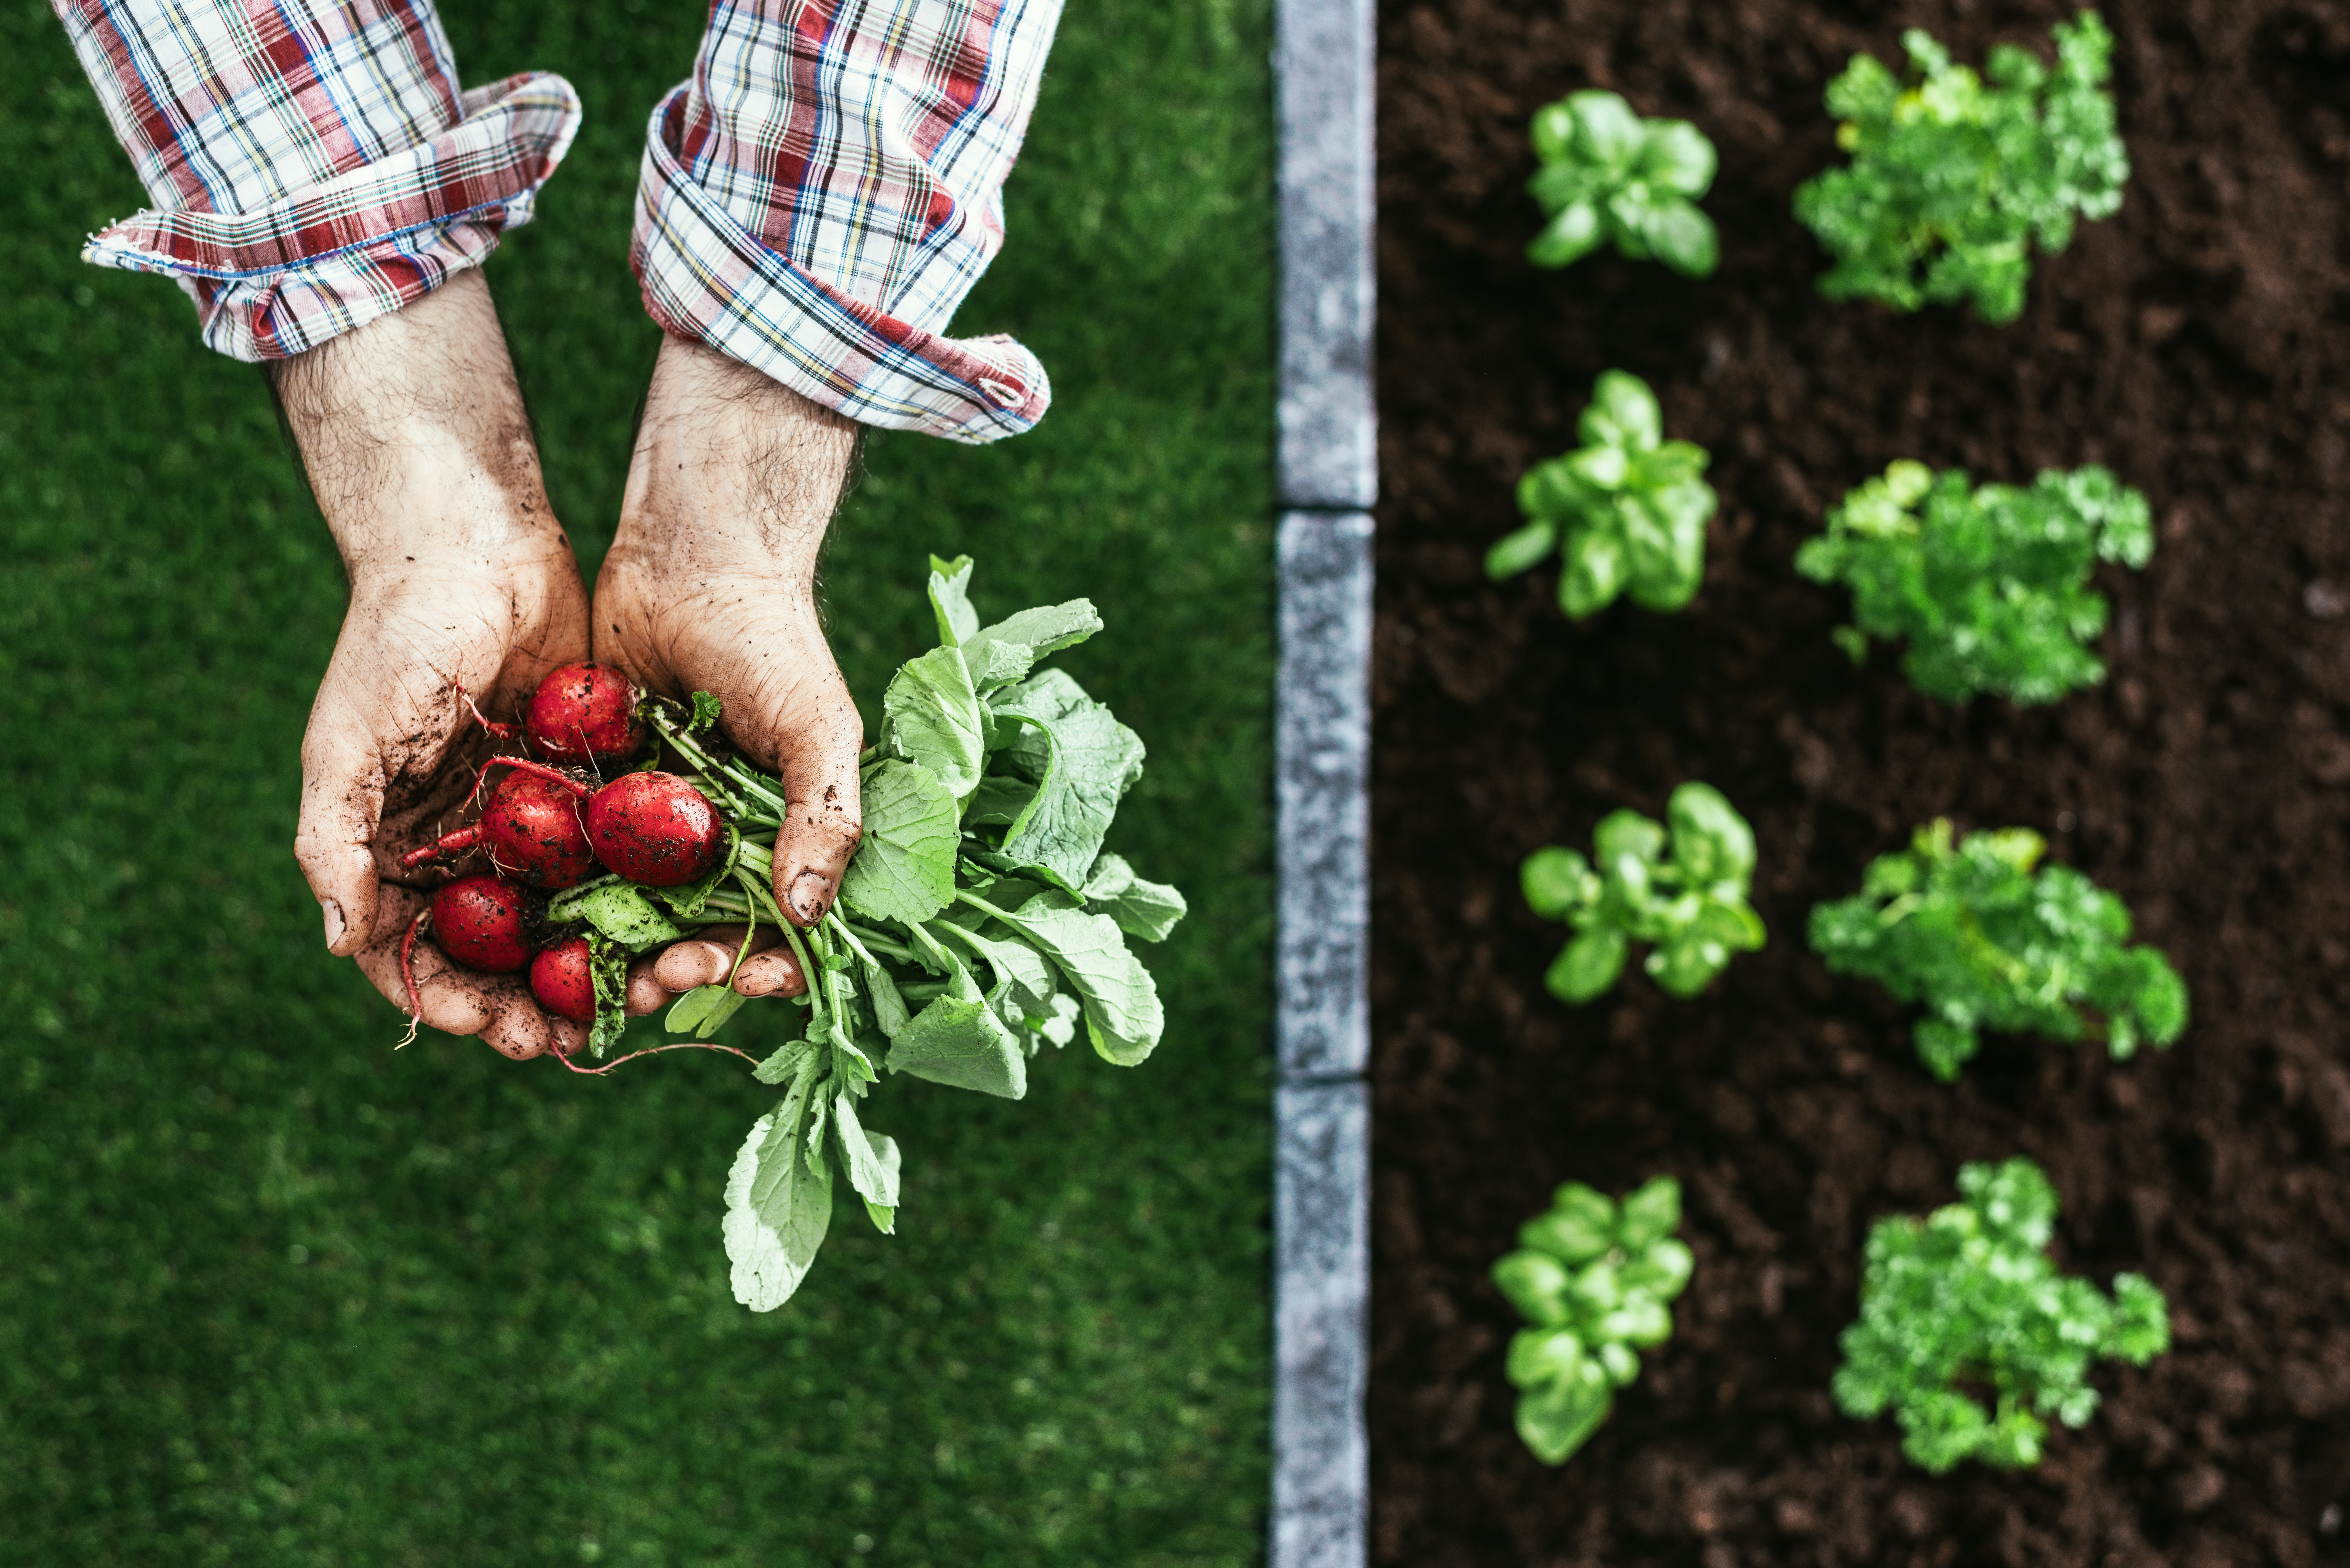 UK restaurants: Putting sustainability on the menu